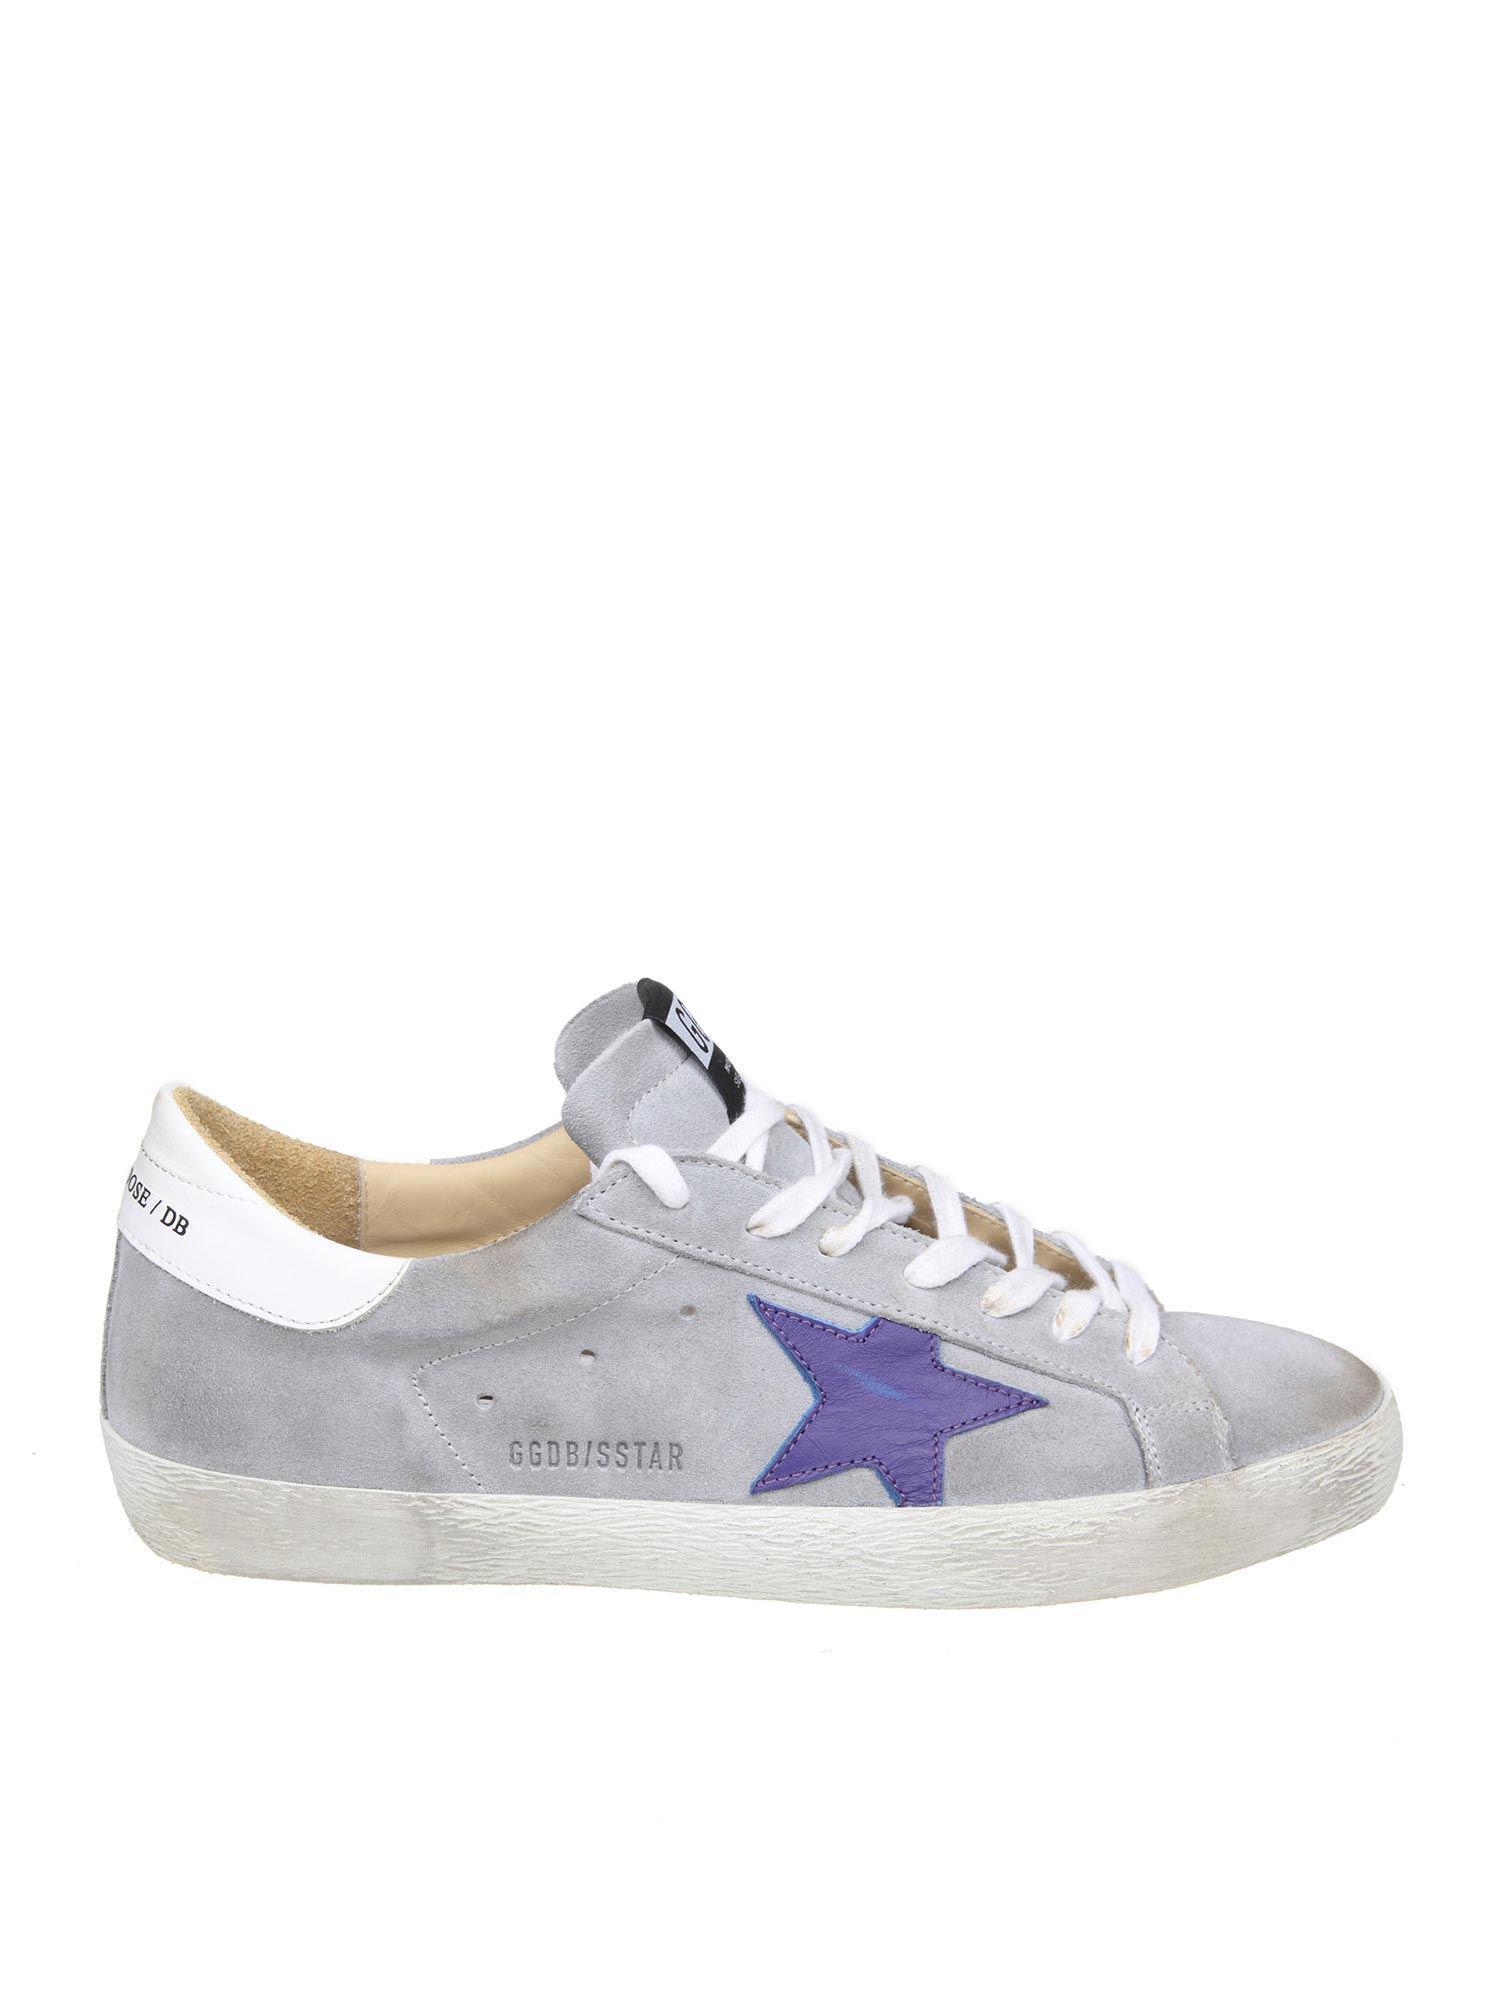 eaeafd27b4ed Golden Goose Deluxe Brand Superstar Grey Sneakers With Purple Star ...